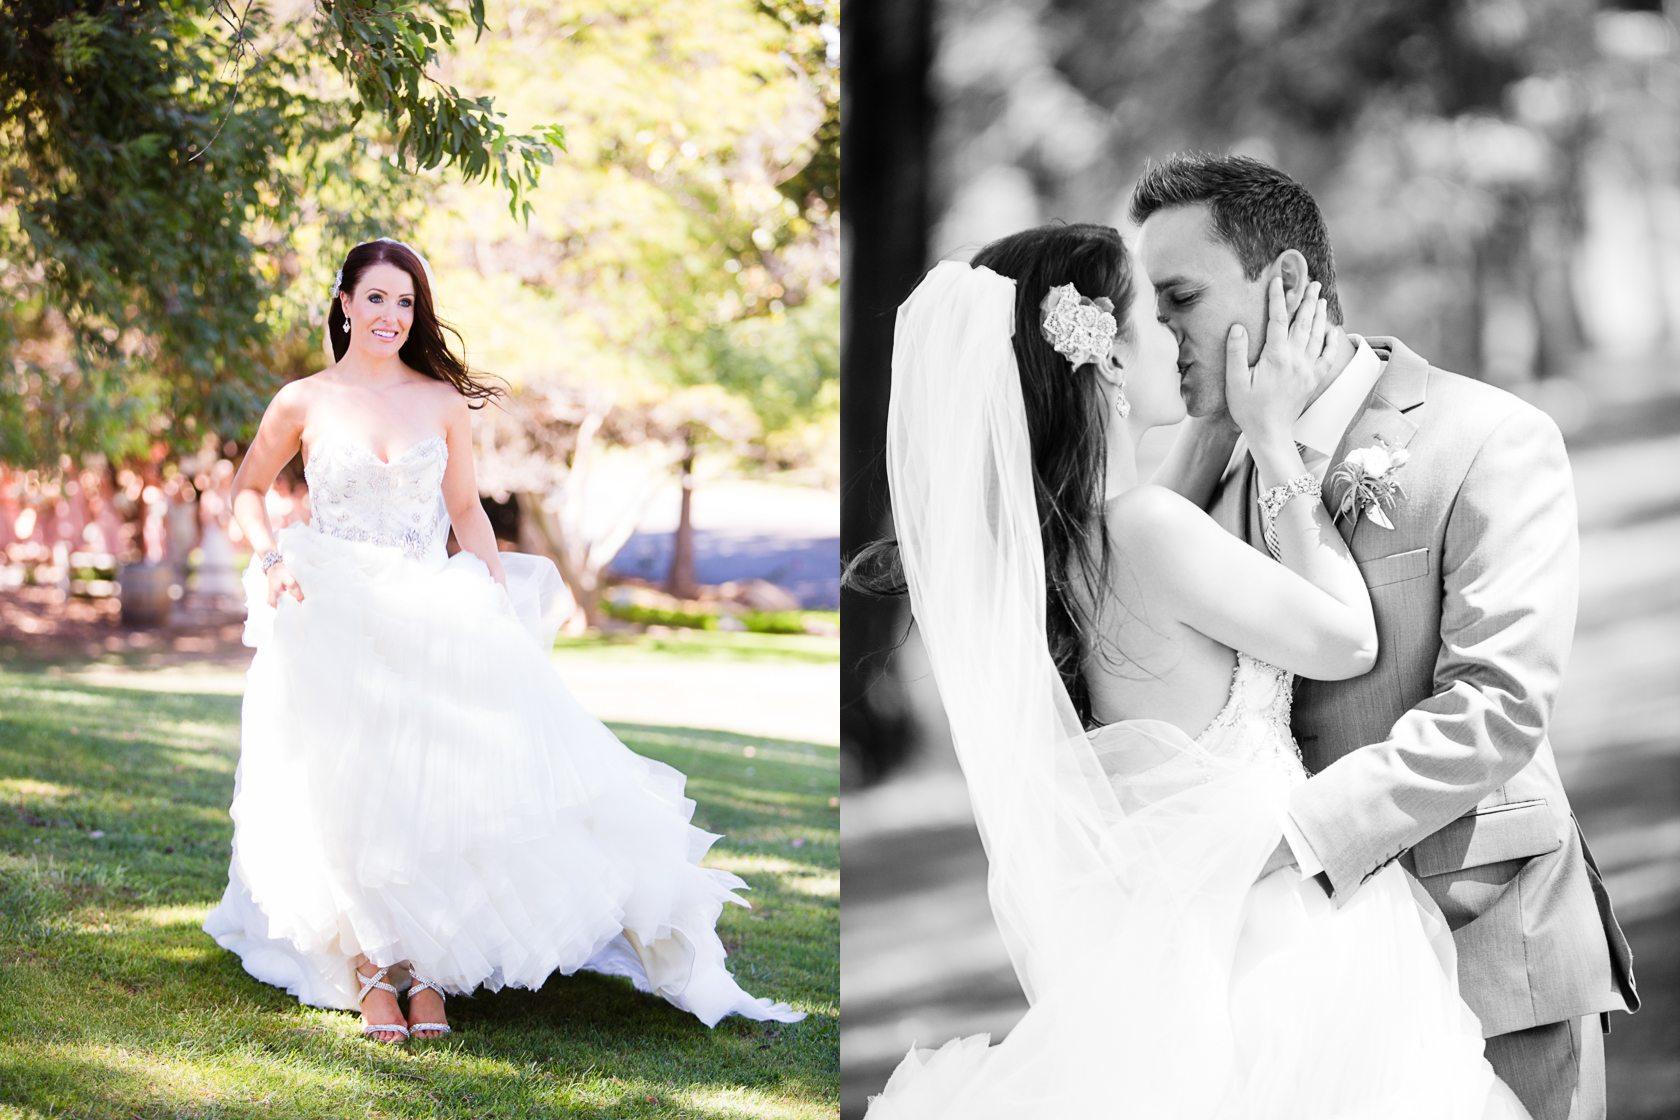 Temecula_Creek_Inn_Wedding_029.jpg